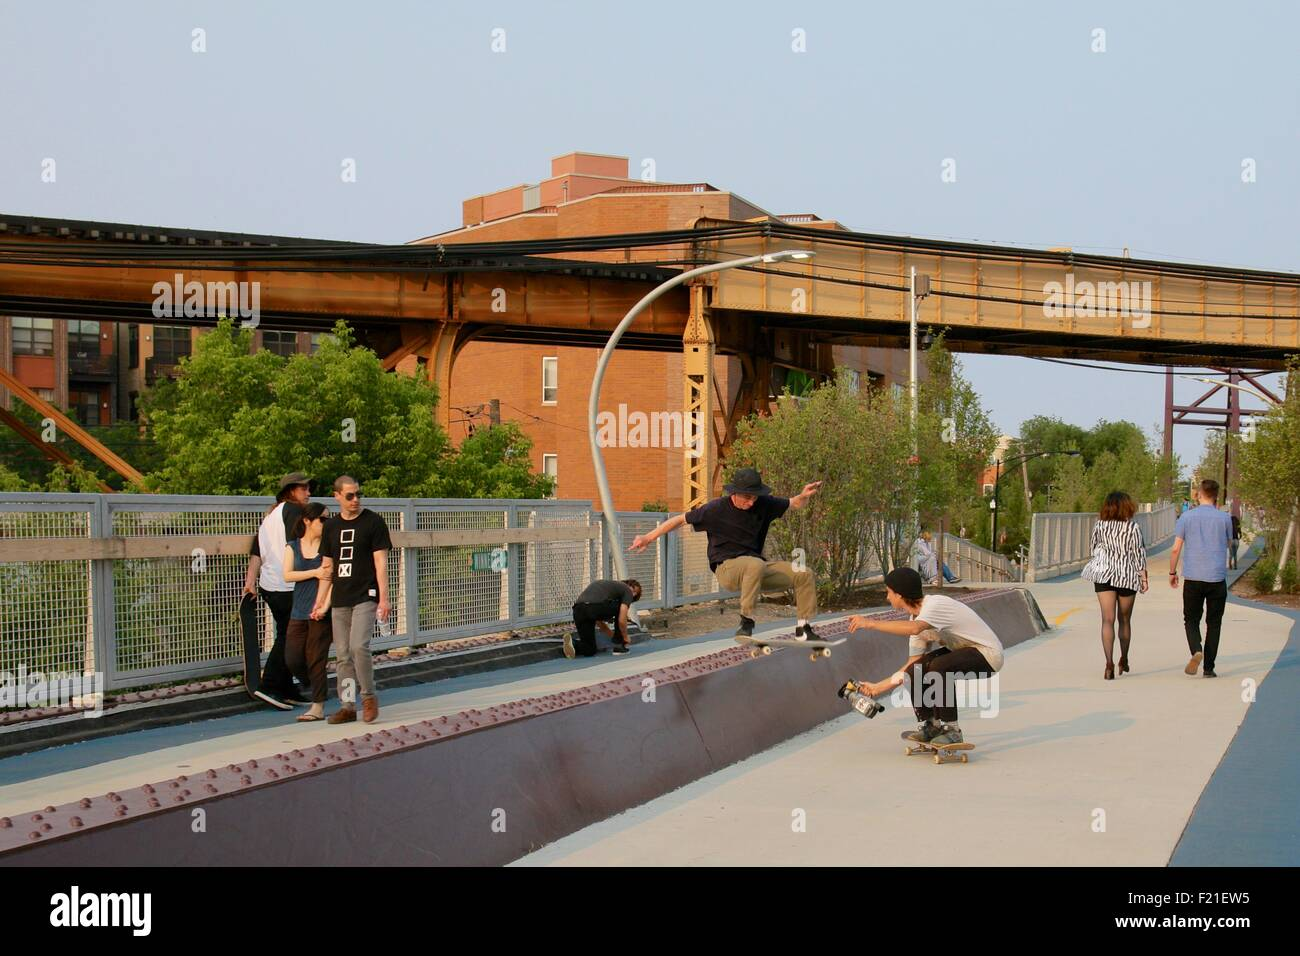 skateboard-stunt-on-the-bloomingdale-tra